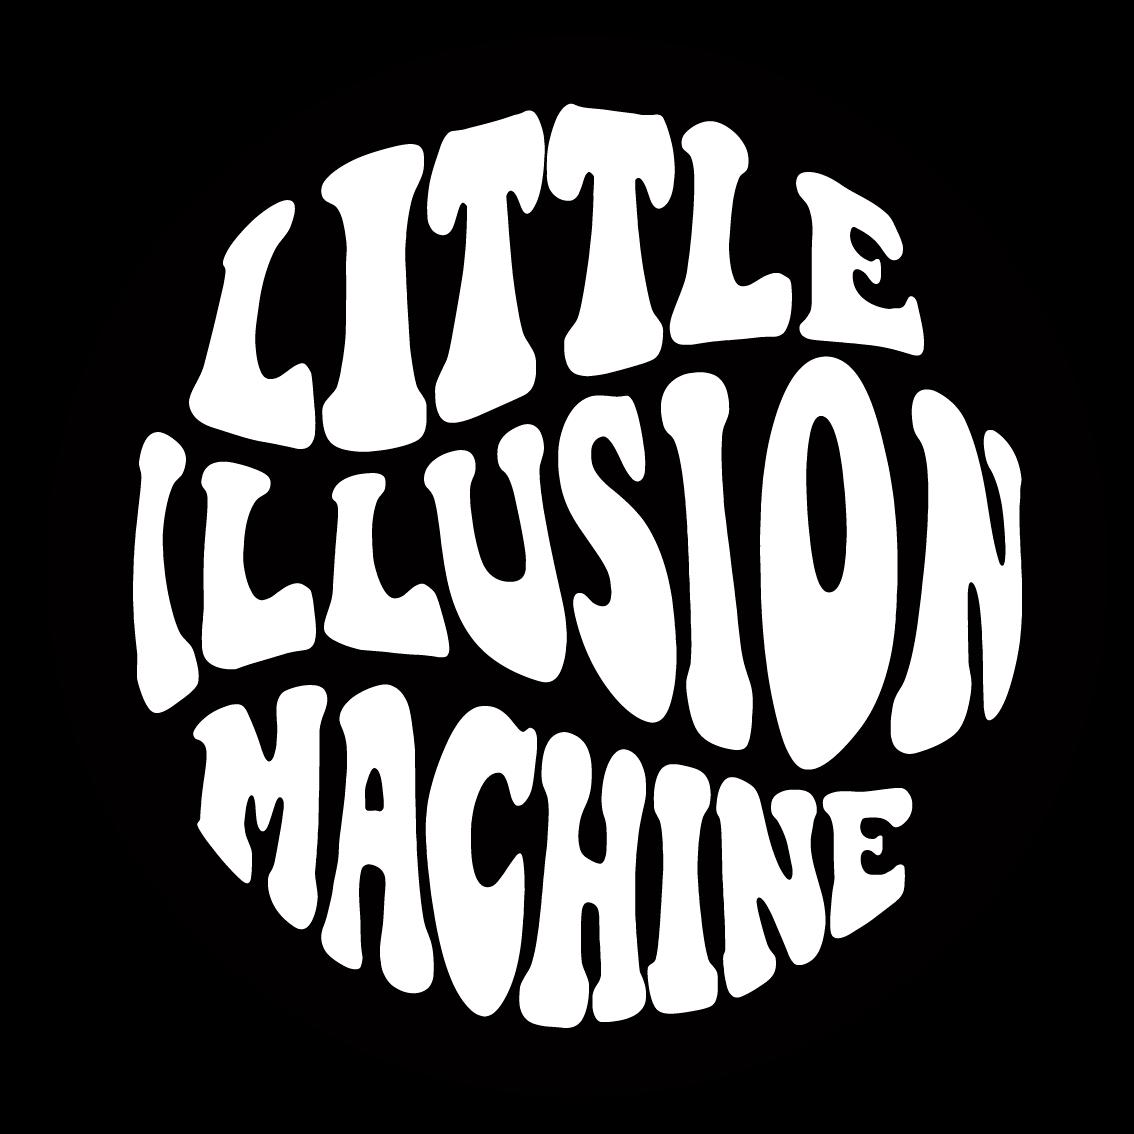 Little Illusion Machine